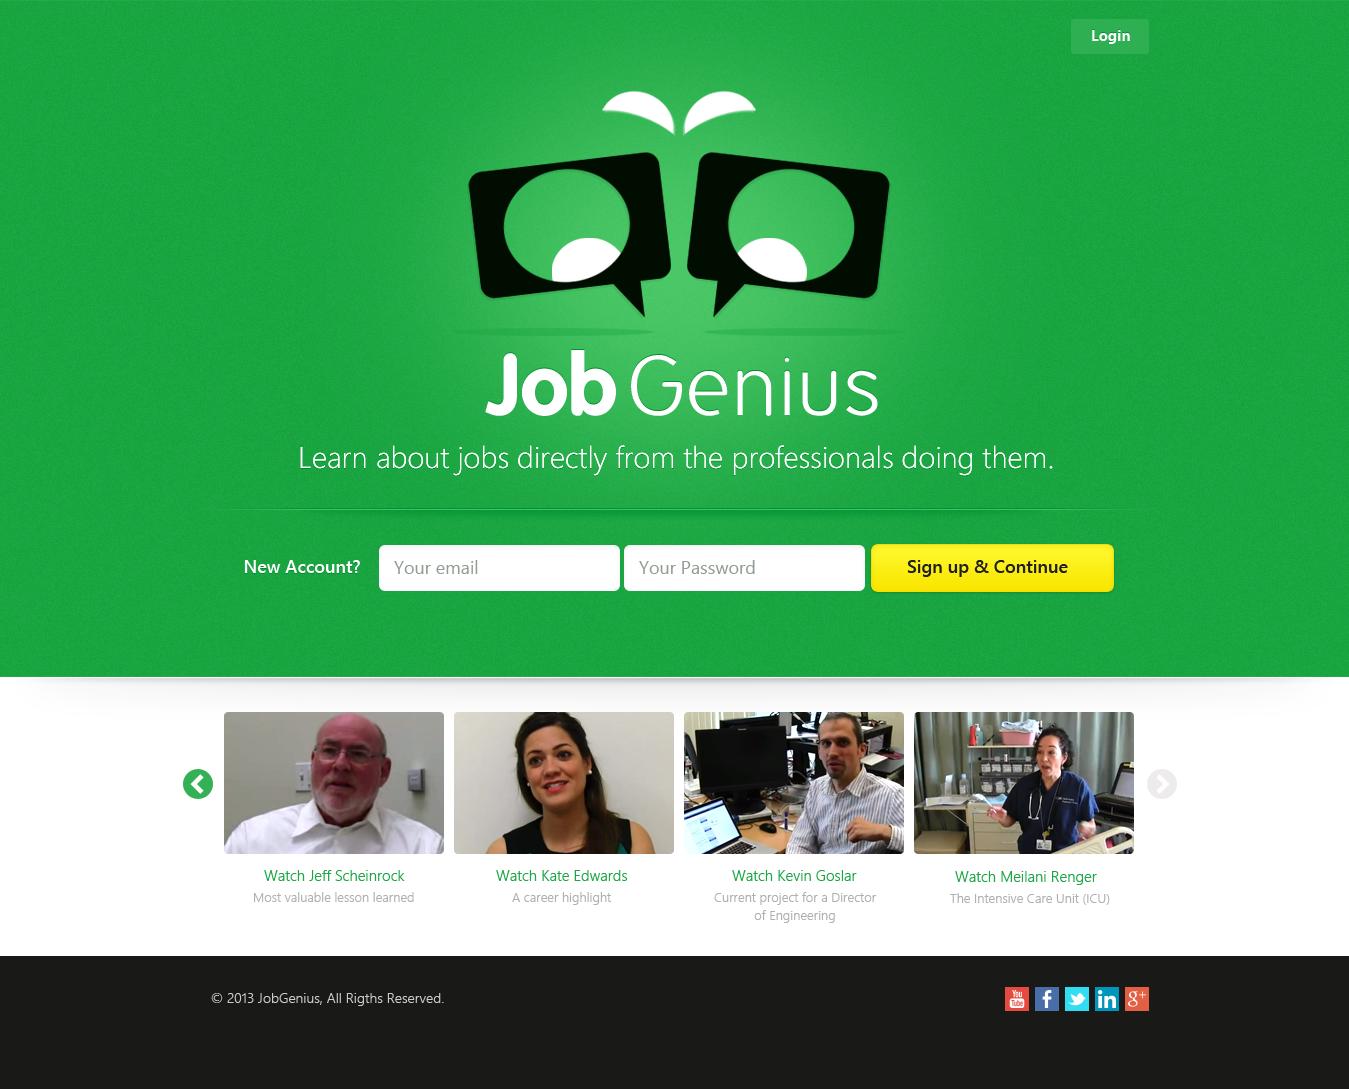 Job Genius needs a new website design